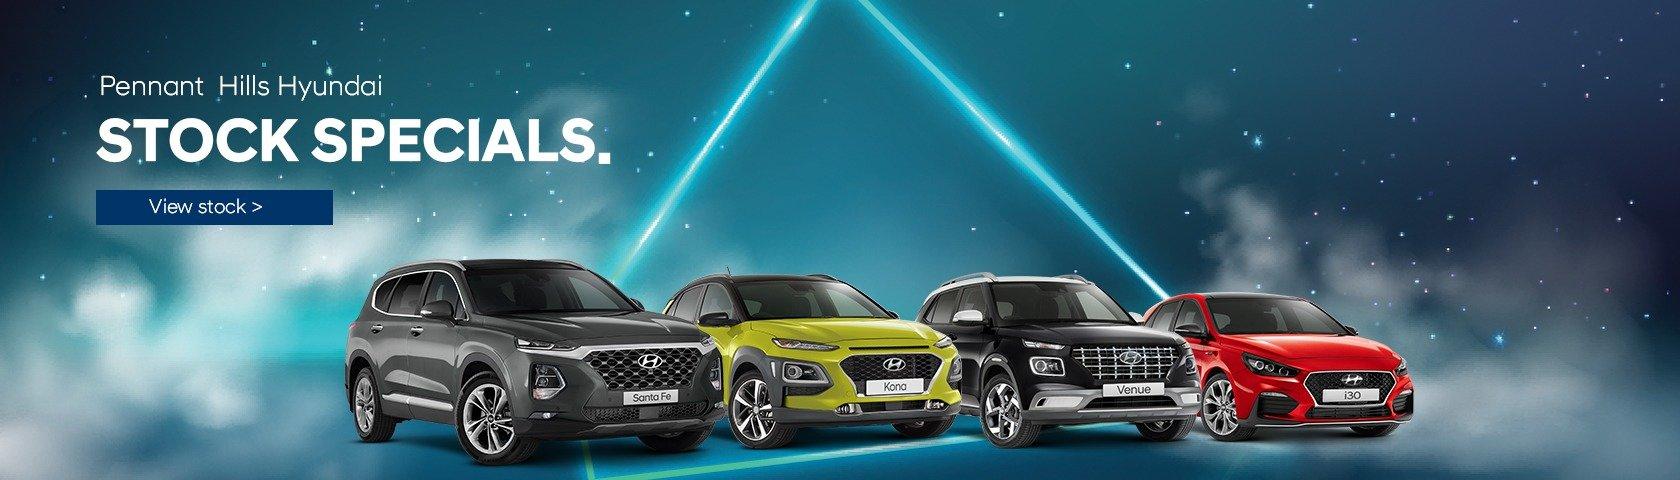 Pennant Hills Hyundai | Stock Specials